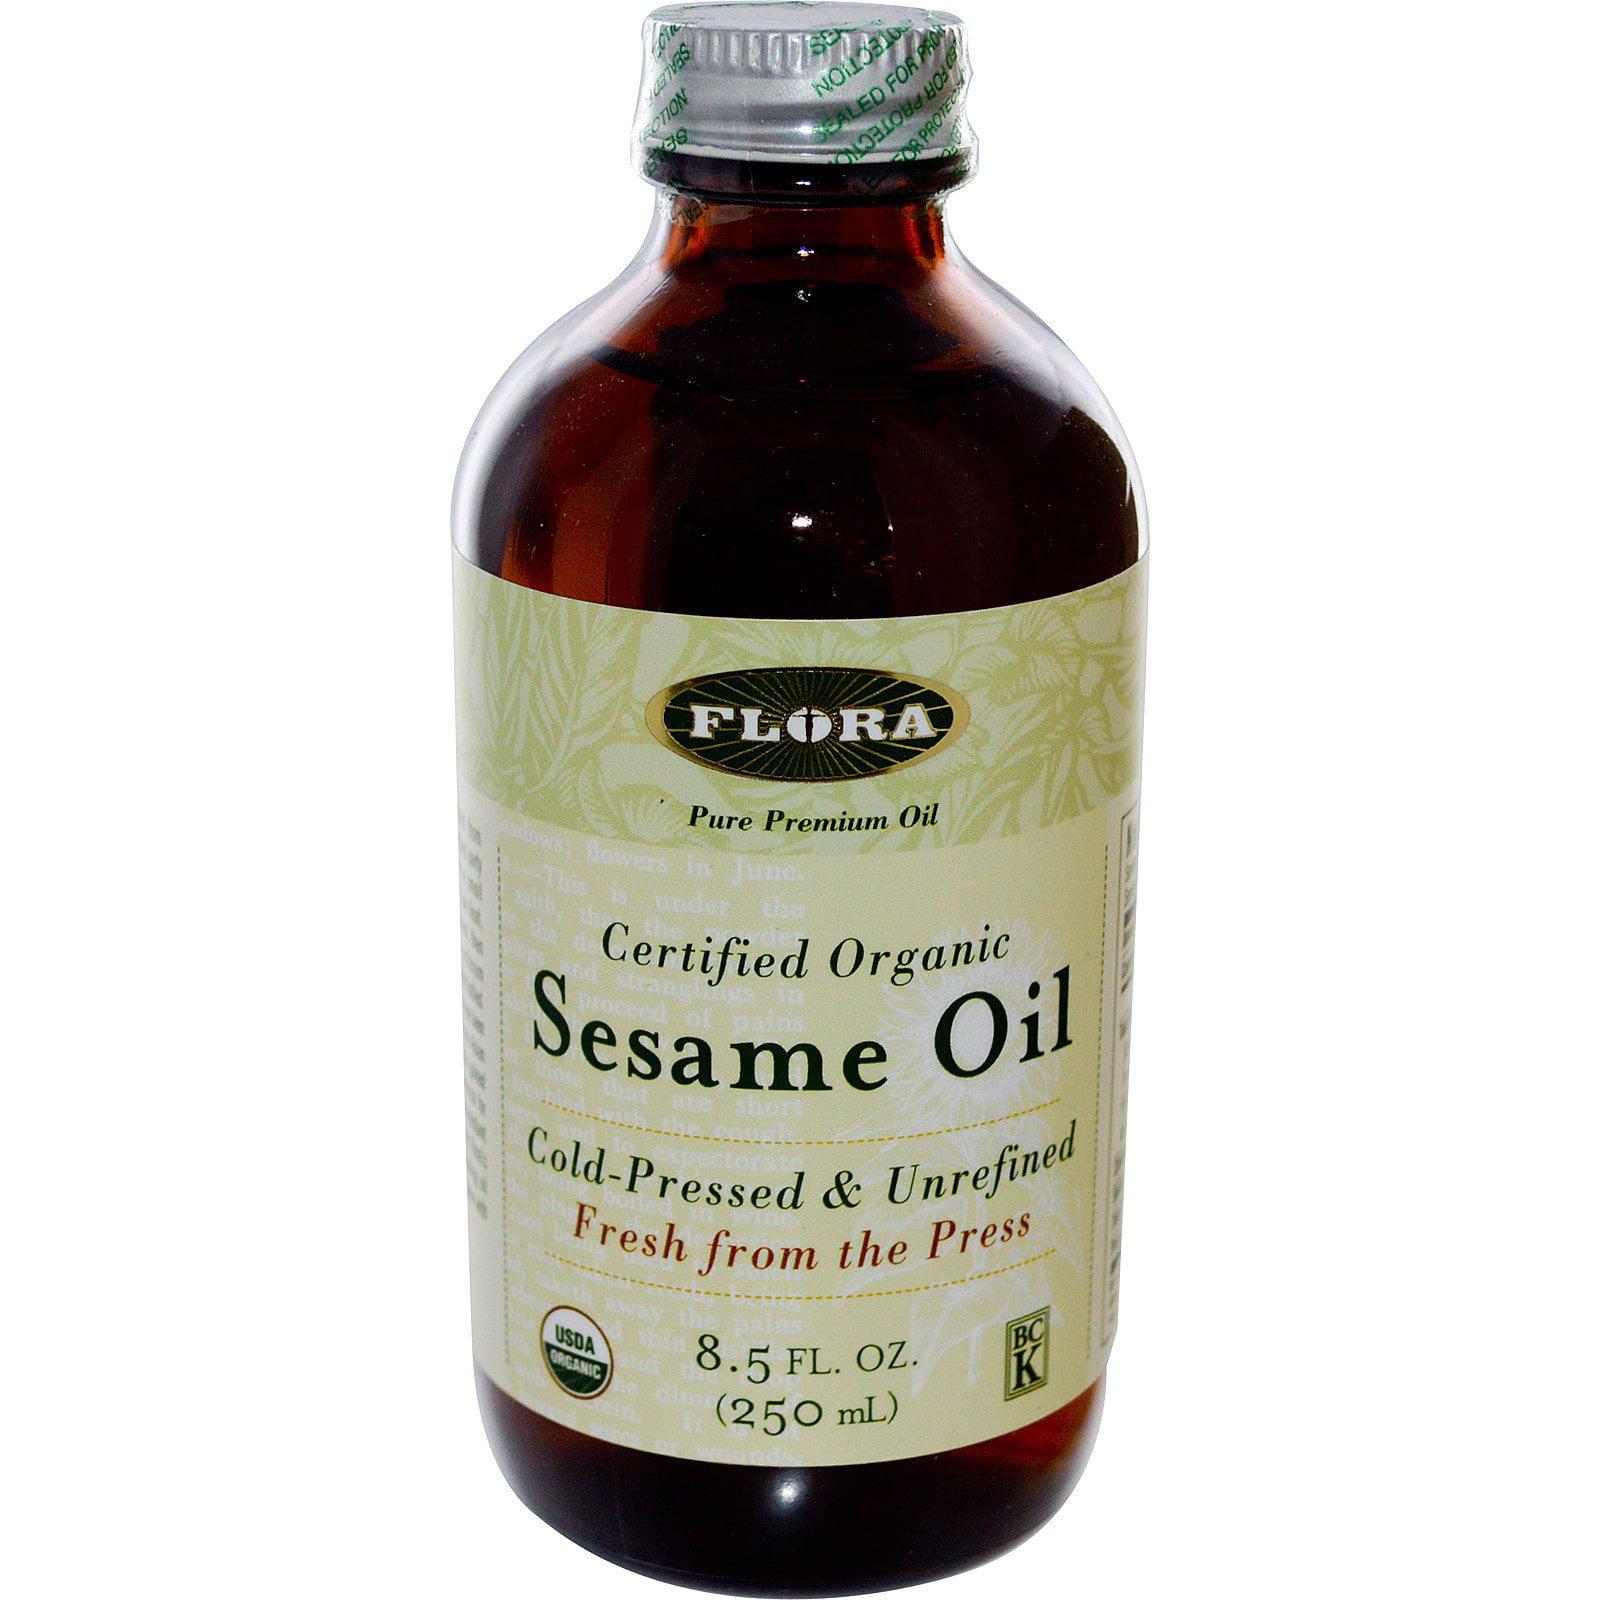 Flora, Certified Organic Sesame Oil, 8.5 fl oz (pack of 1)